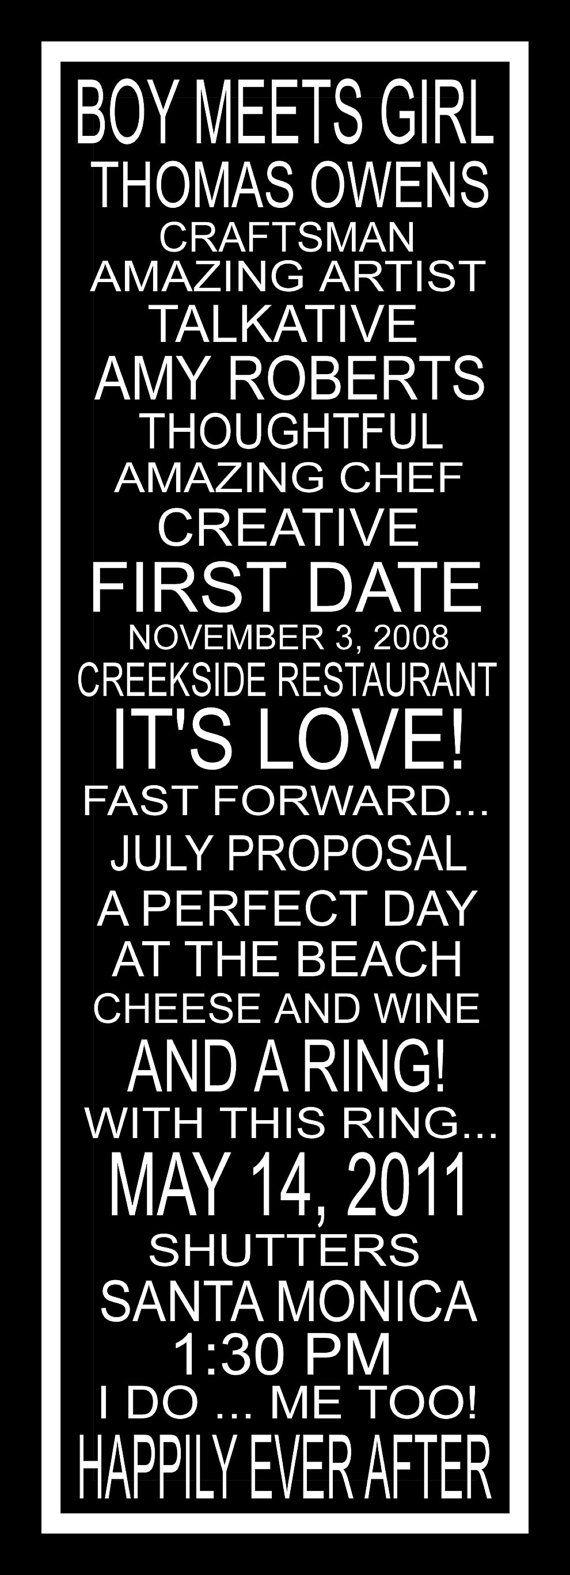 Wedding Gift Subway Art : Subway Art Sign Personalized Typography Wedding/Anniversary/Engagemen ...